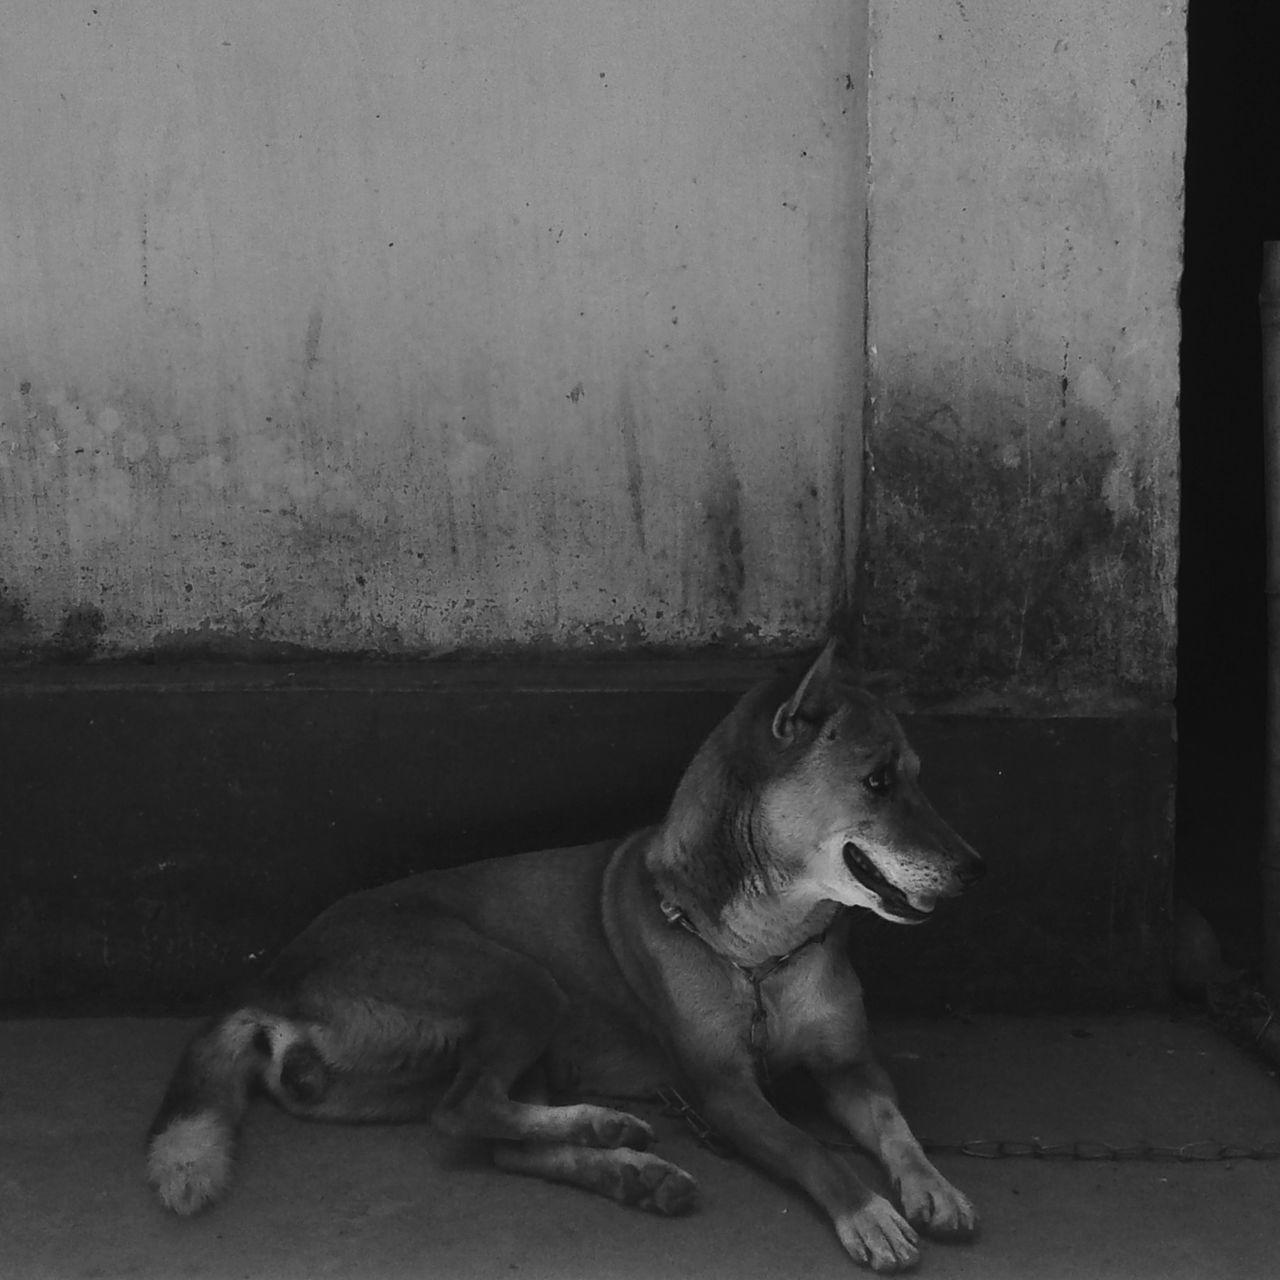 Hqpy sunday Bestoftheday Tones Bestshot EyeEmBestPics Adventure Club EyeEm Best Shots India Hello World EyeEm Gallery Wanderlust VSCO Nature_collection Friendship Dog